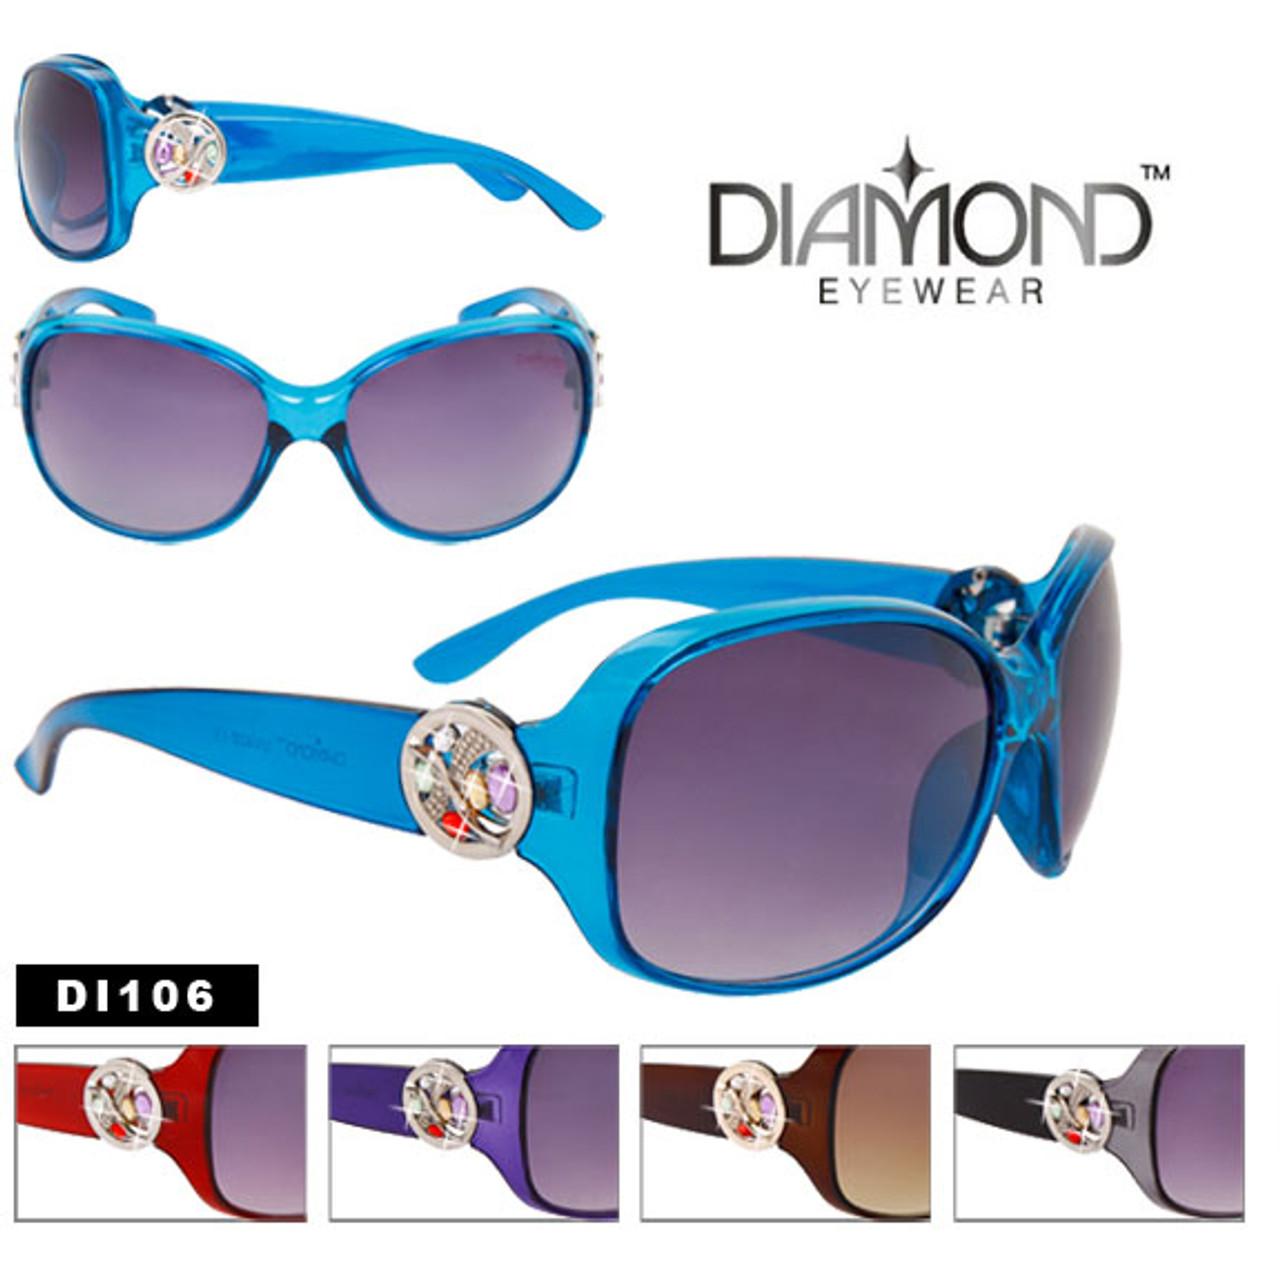 Women's Fashion Sunglasses   Diamond Eyewear